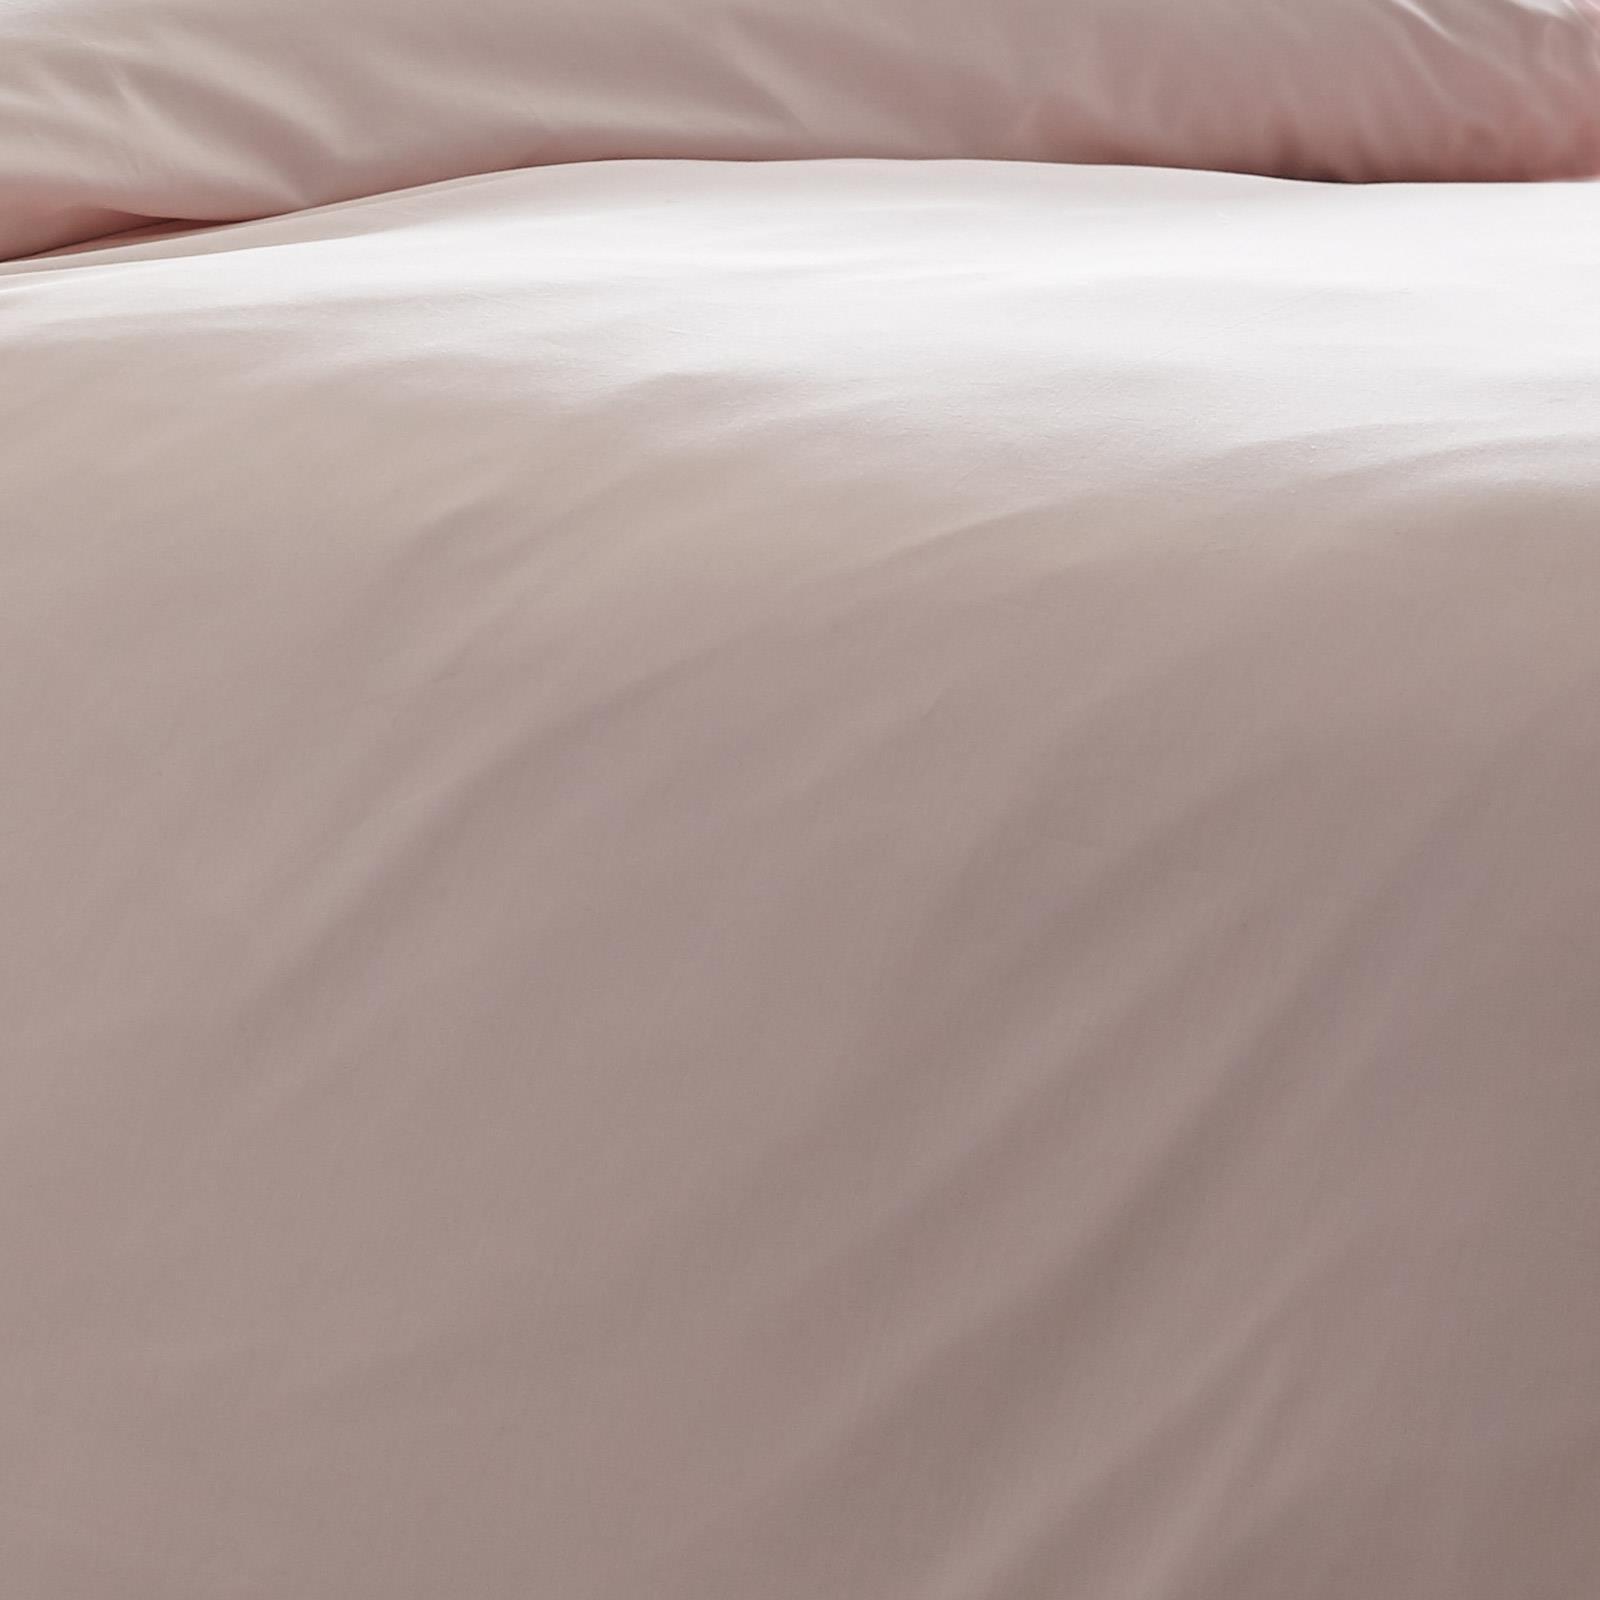 Blush-fundas-nordicas-Rosa-100-algodon-200-Hilos-Llano-Edredon-Conjuntos-de-Cama miniatura 21